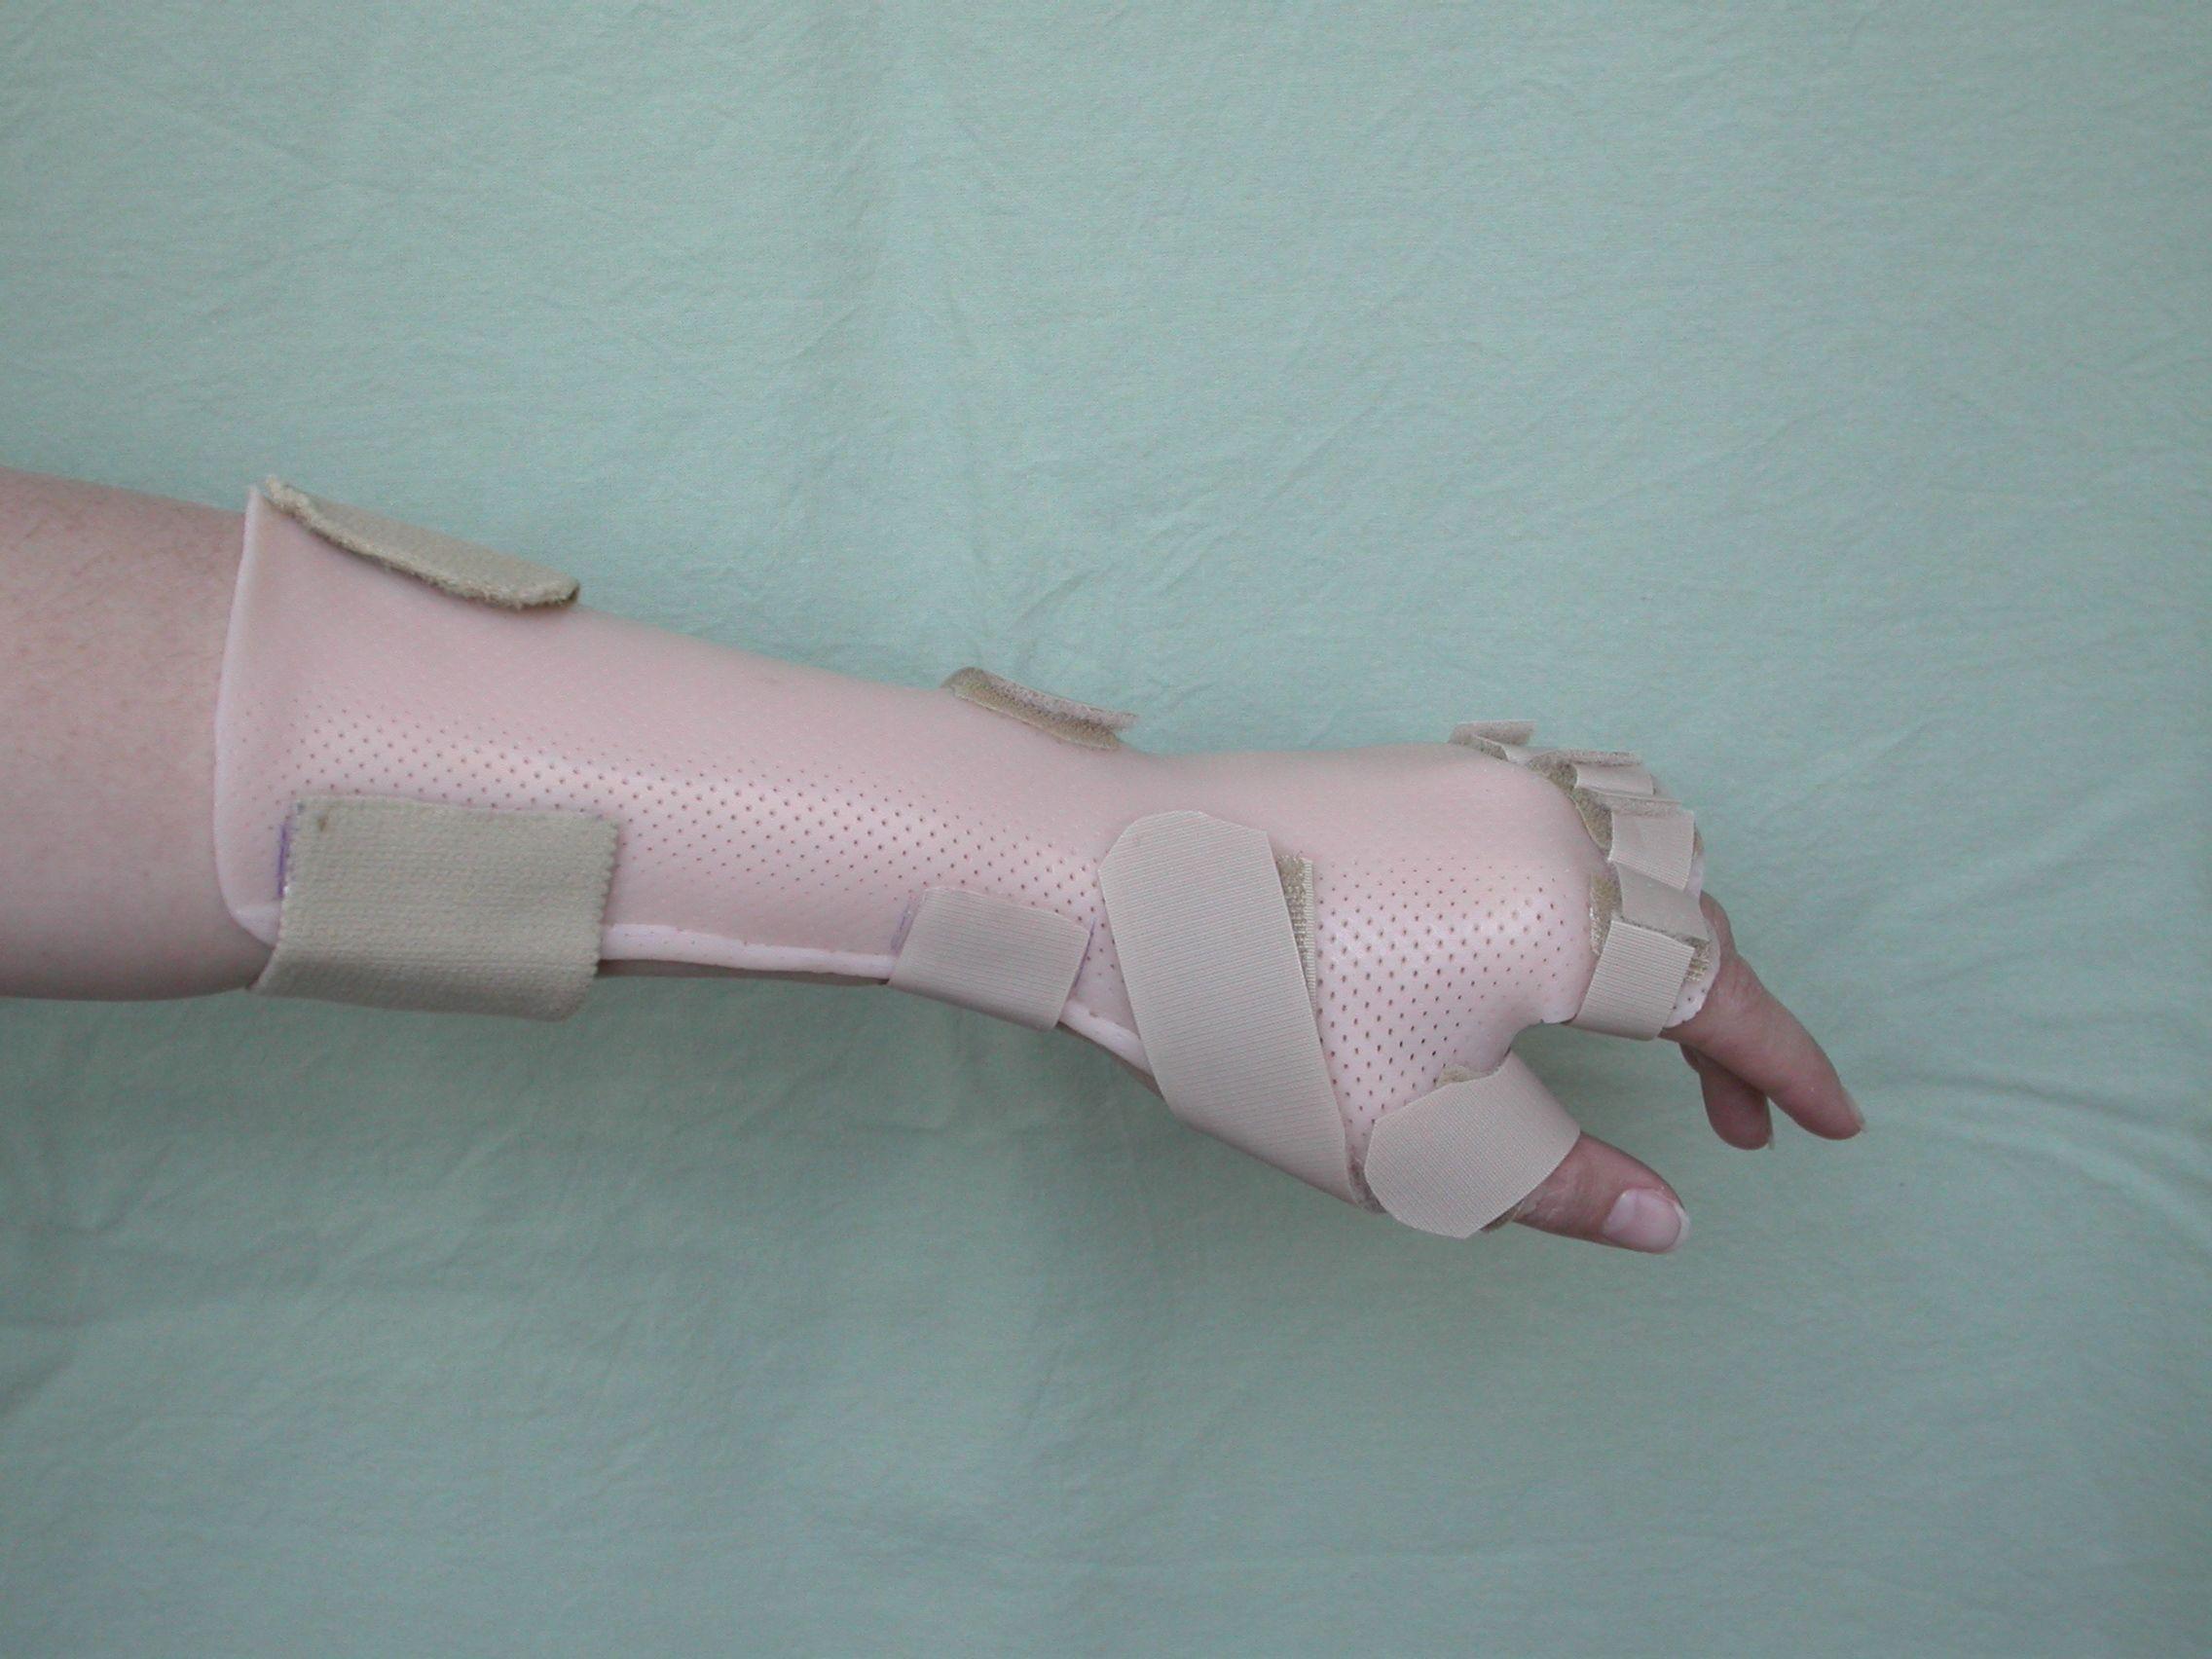 Splint for thumb radial nerve surgery